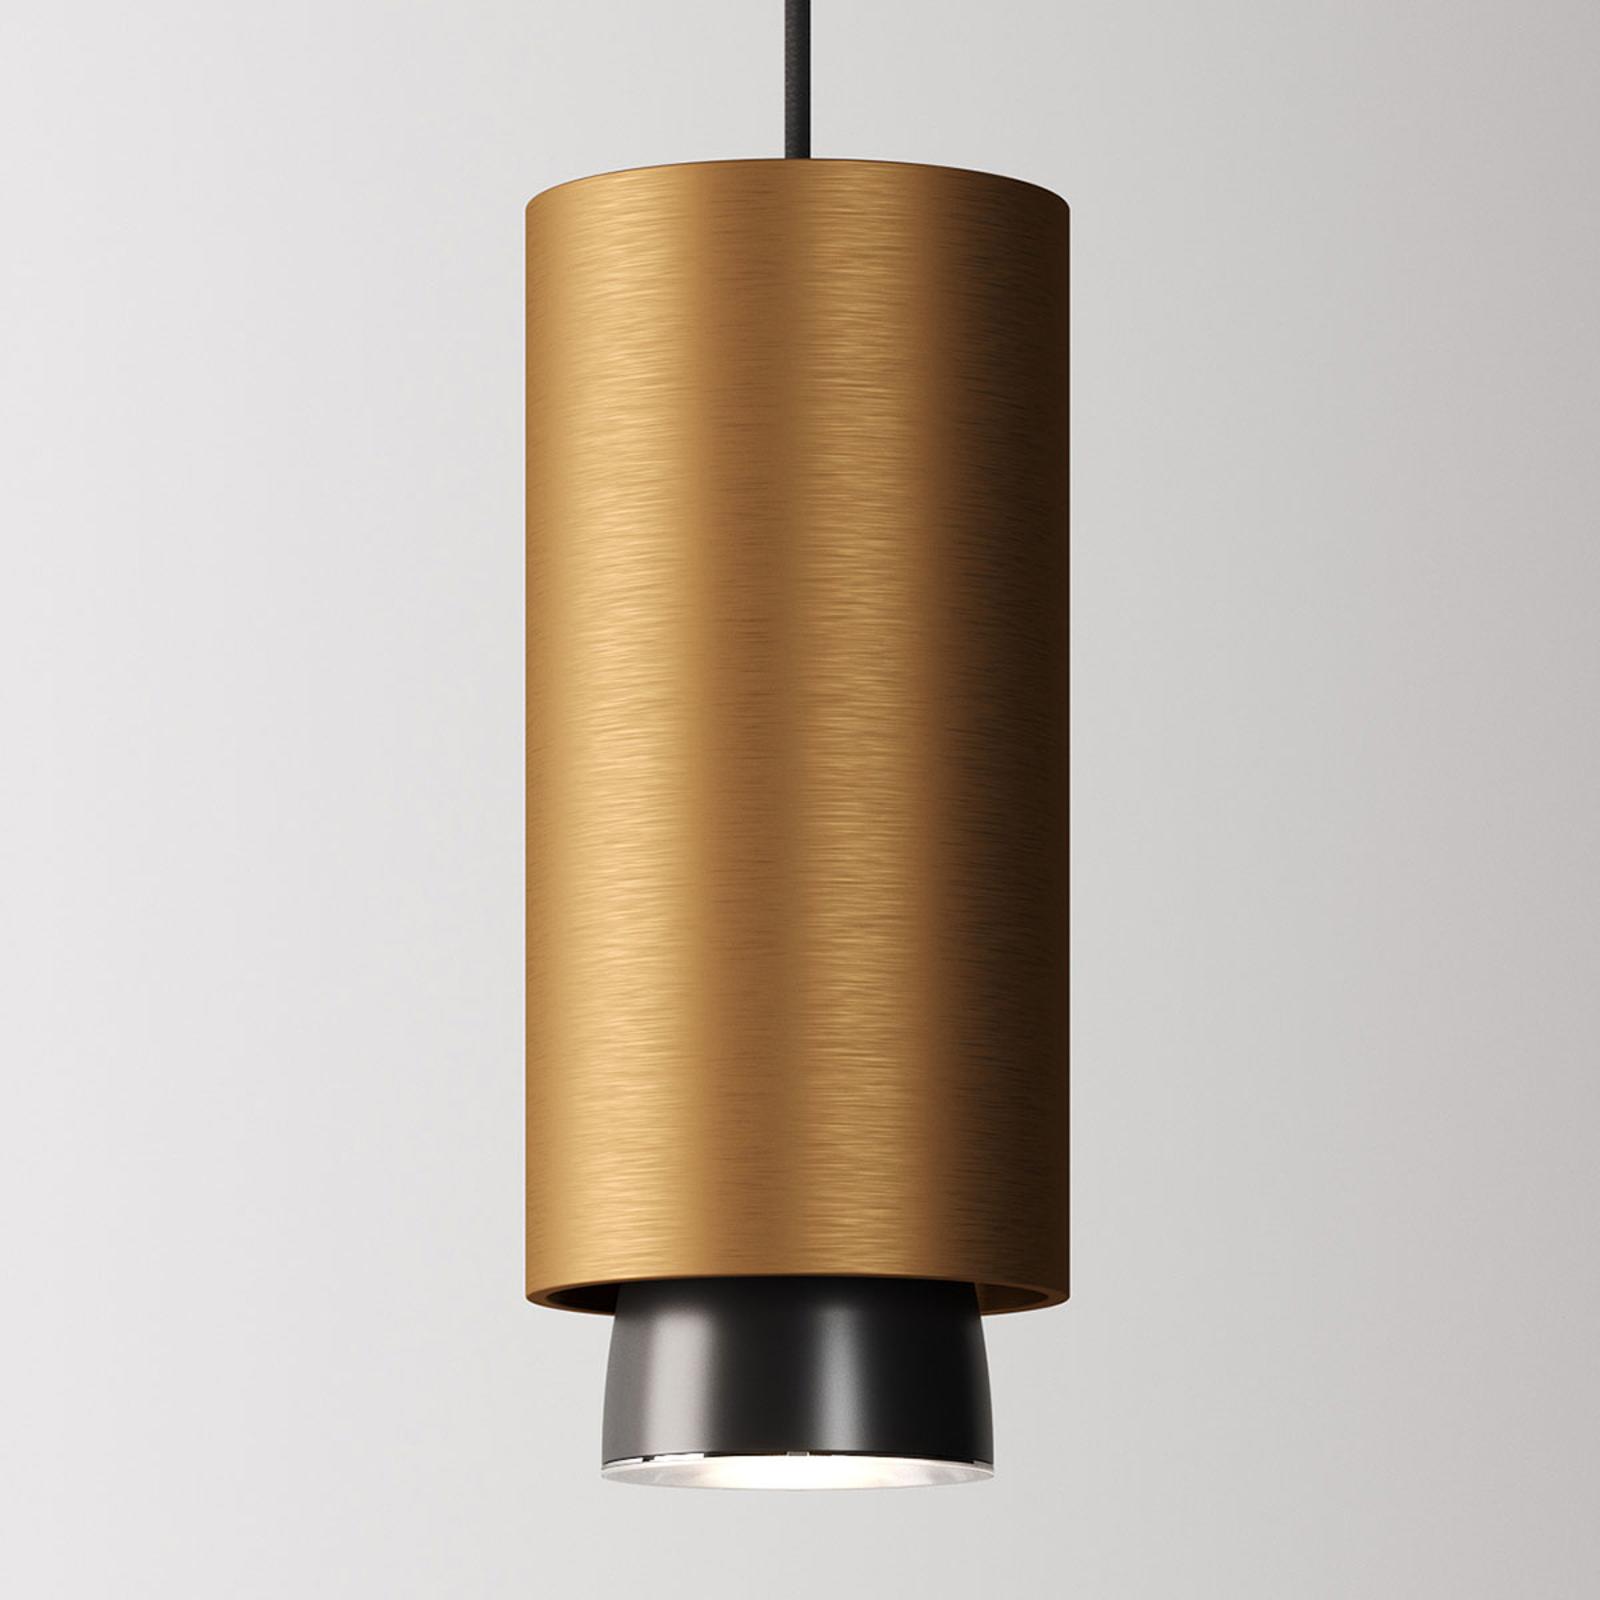 Fabbian Claque LED hanglamp 20 cm brons